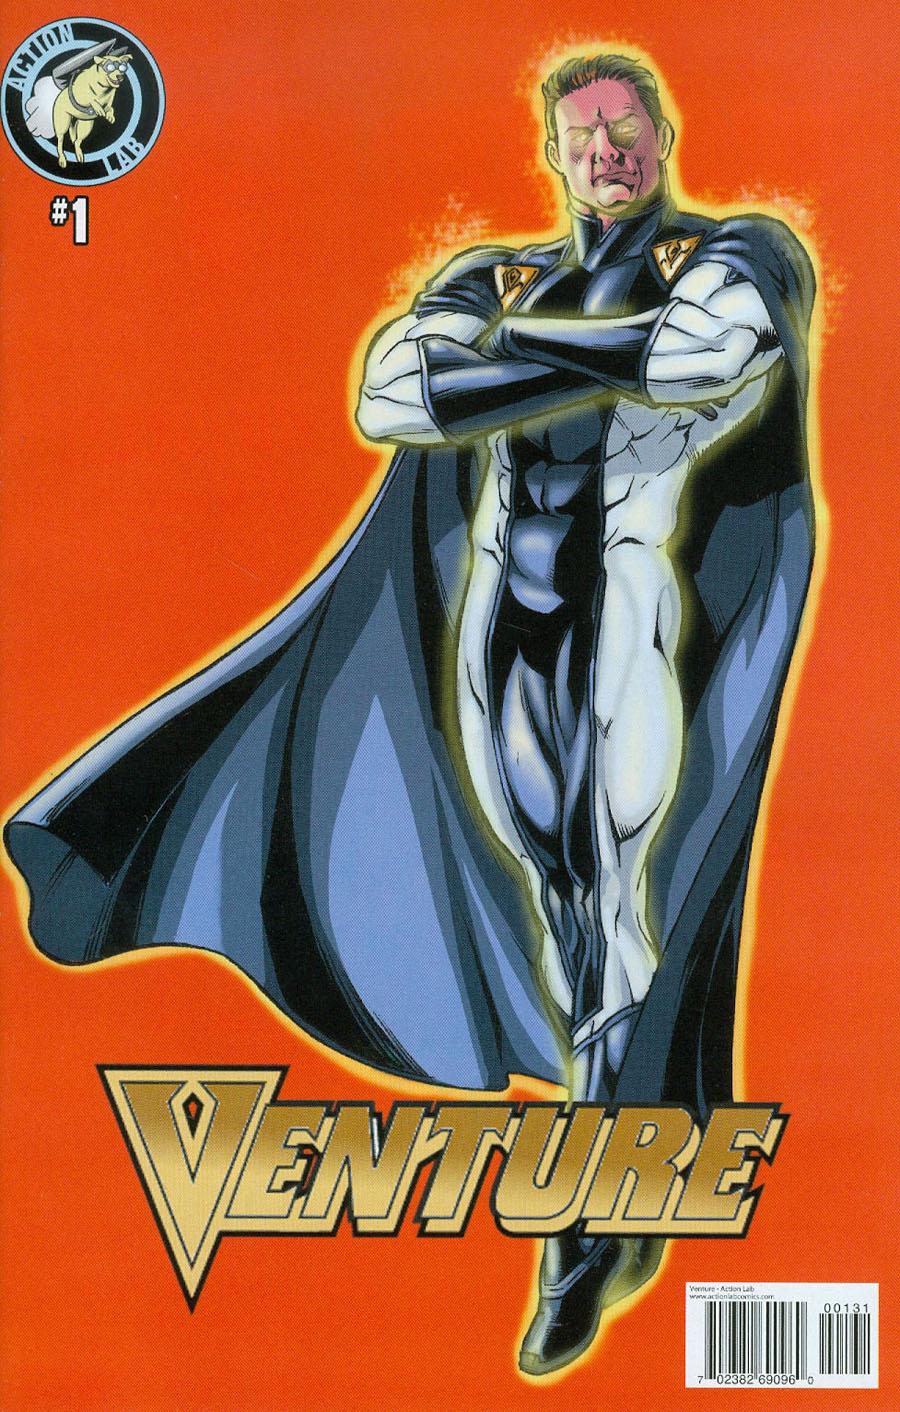 Venture Vol 2 #1 Cover C Variant Jamal Igle Cover